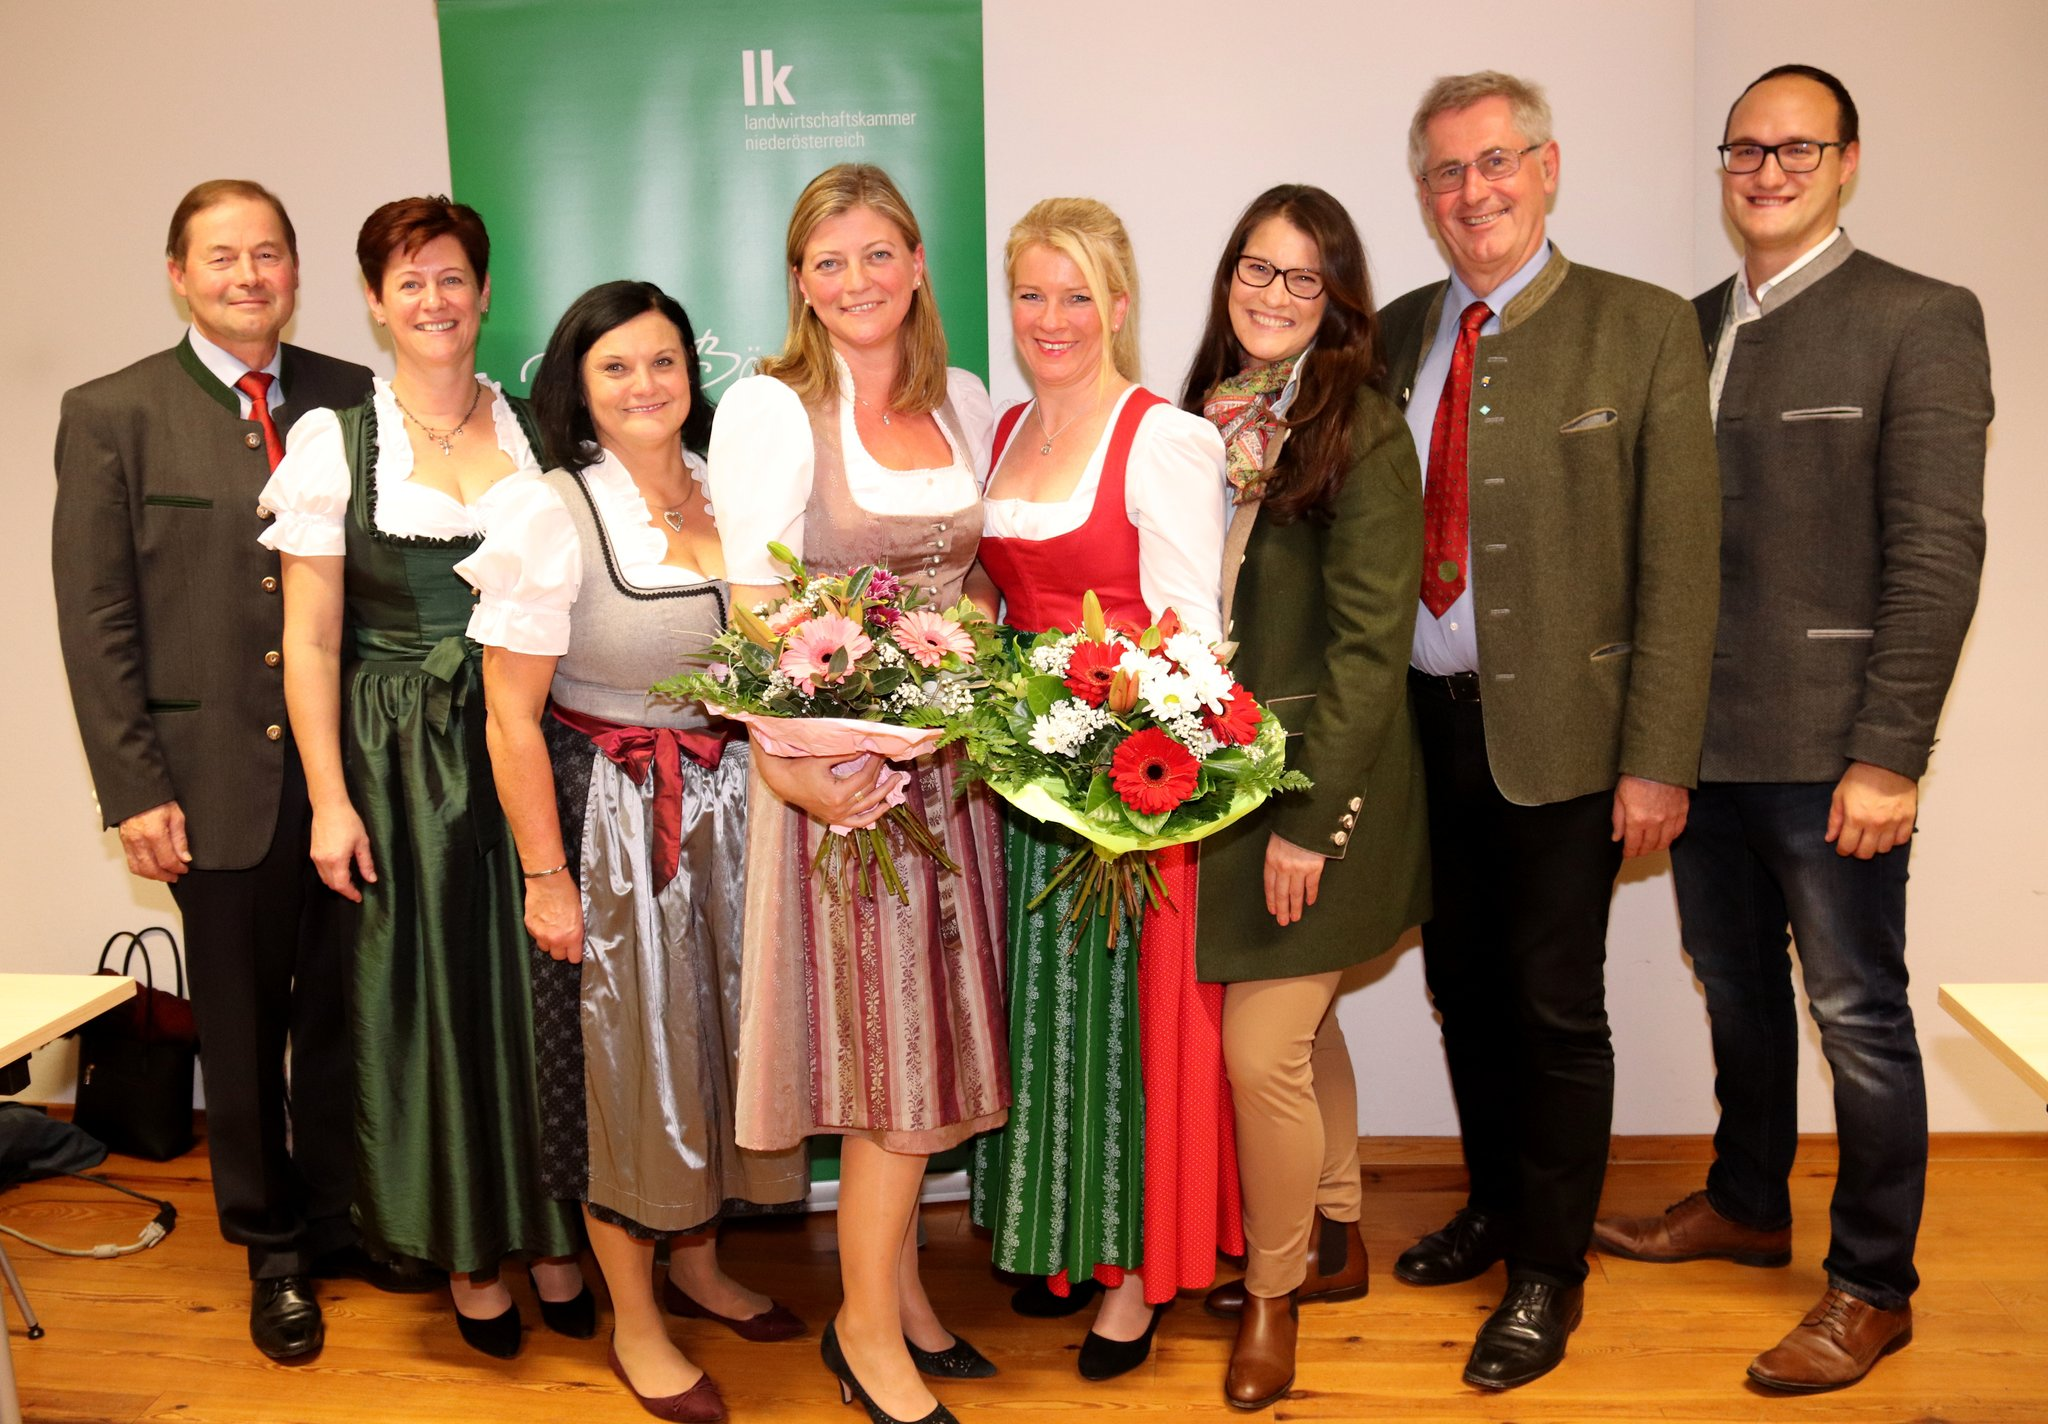 Partnerschaften & Kontakte in Krumbach - kostenlose